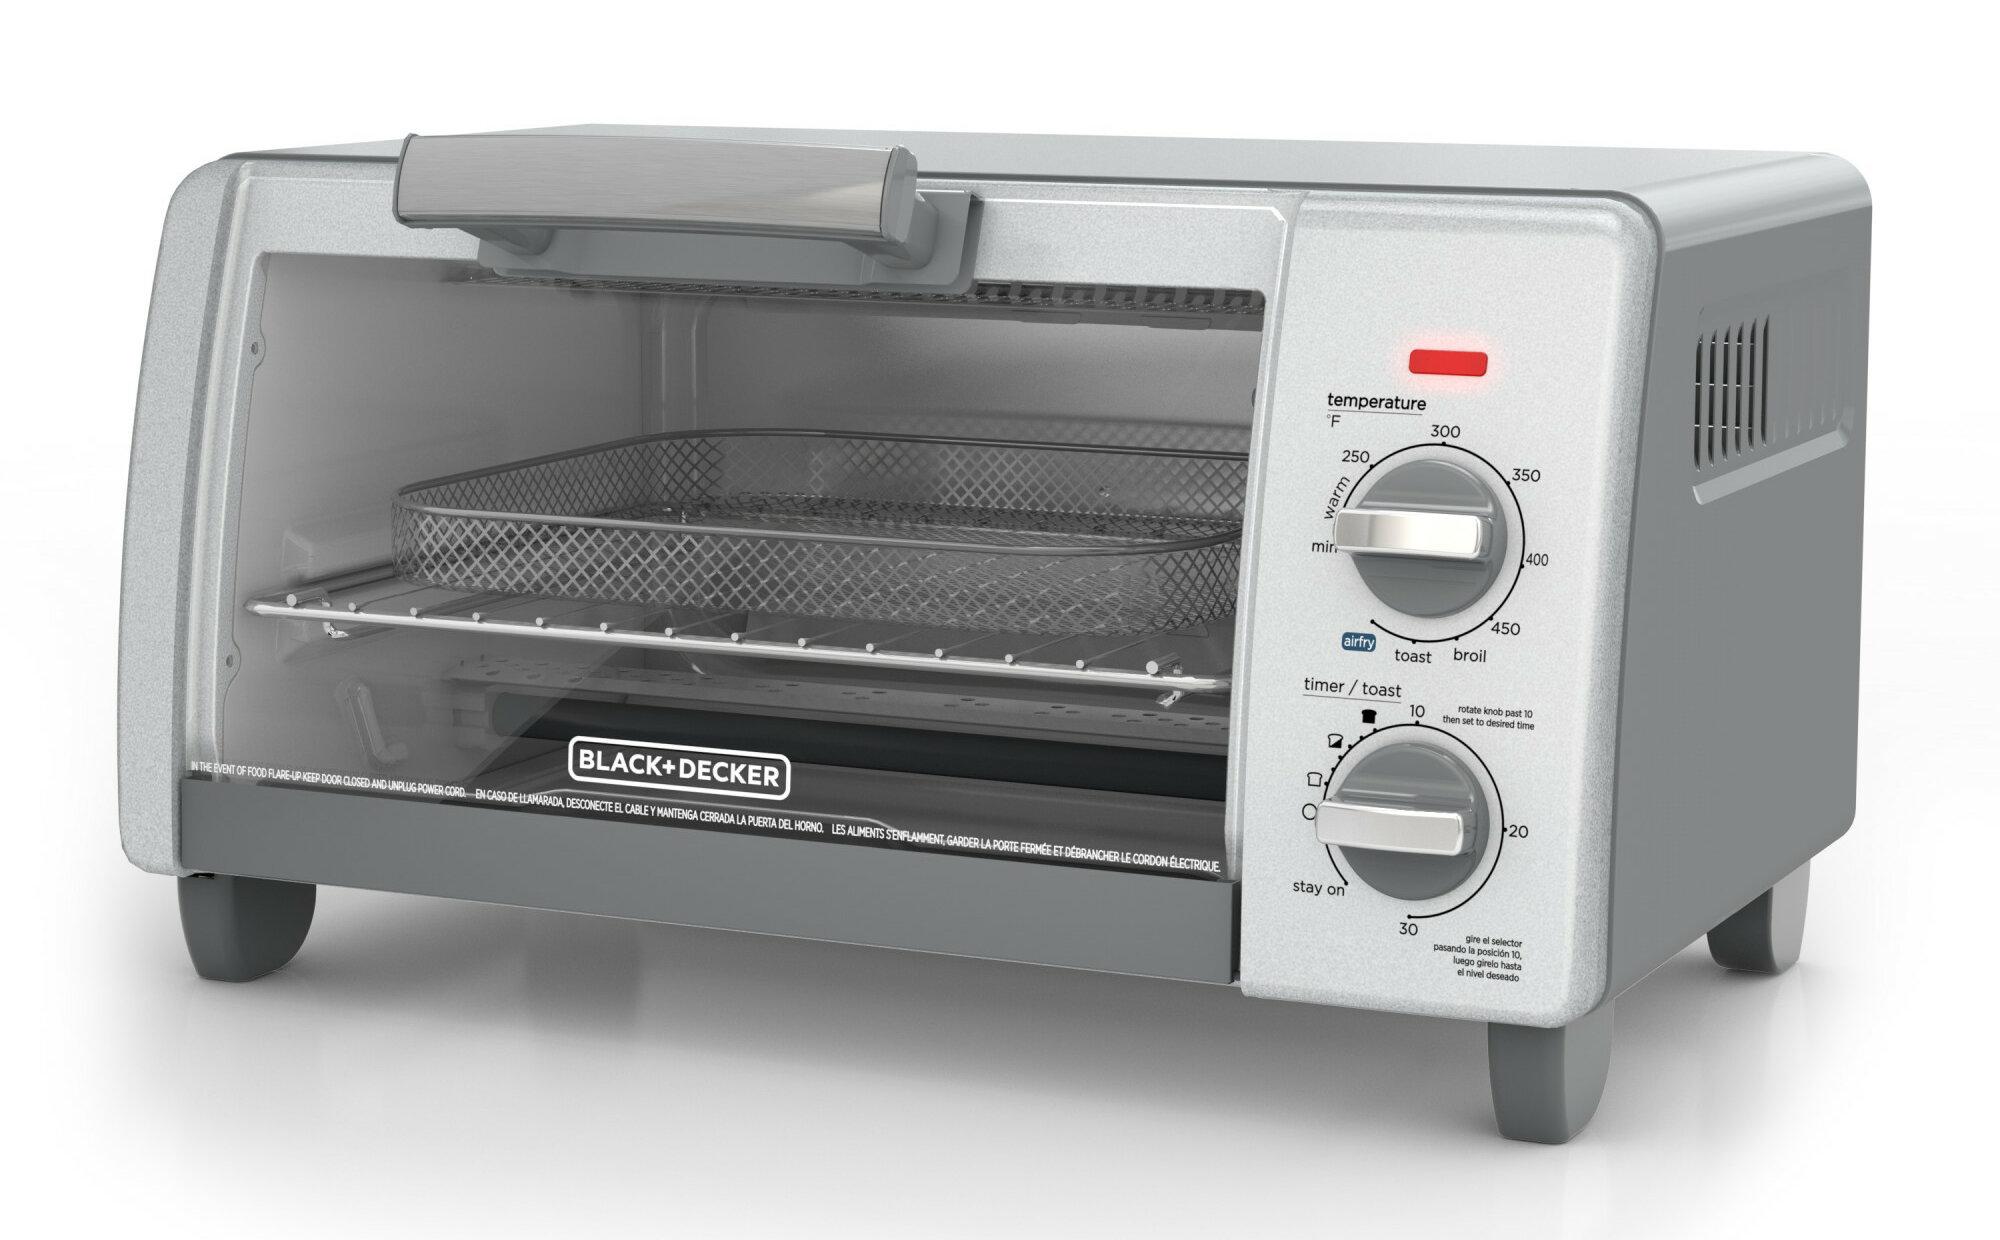 Cuisine Fermée En U black + decker crisp bake air fry 4-slice toaster oven